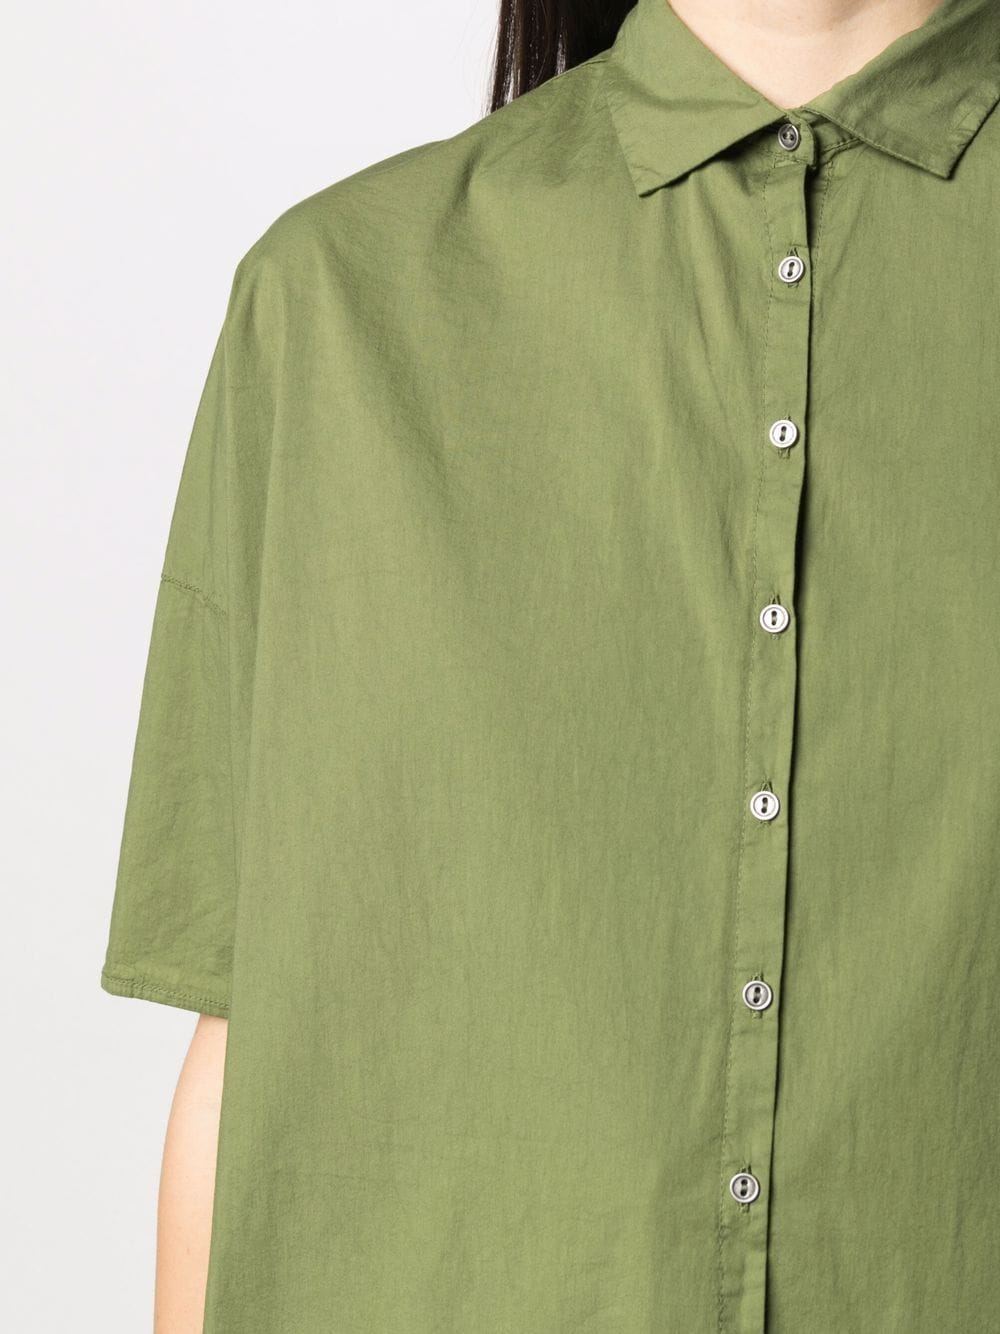 Army green cotton short-sleeved button-up shirt  TRANSIT |  | CFDTRN-M22314